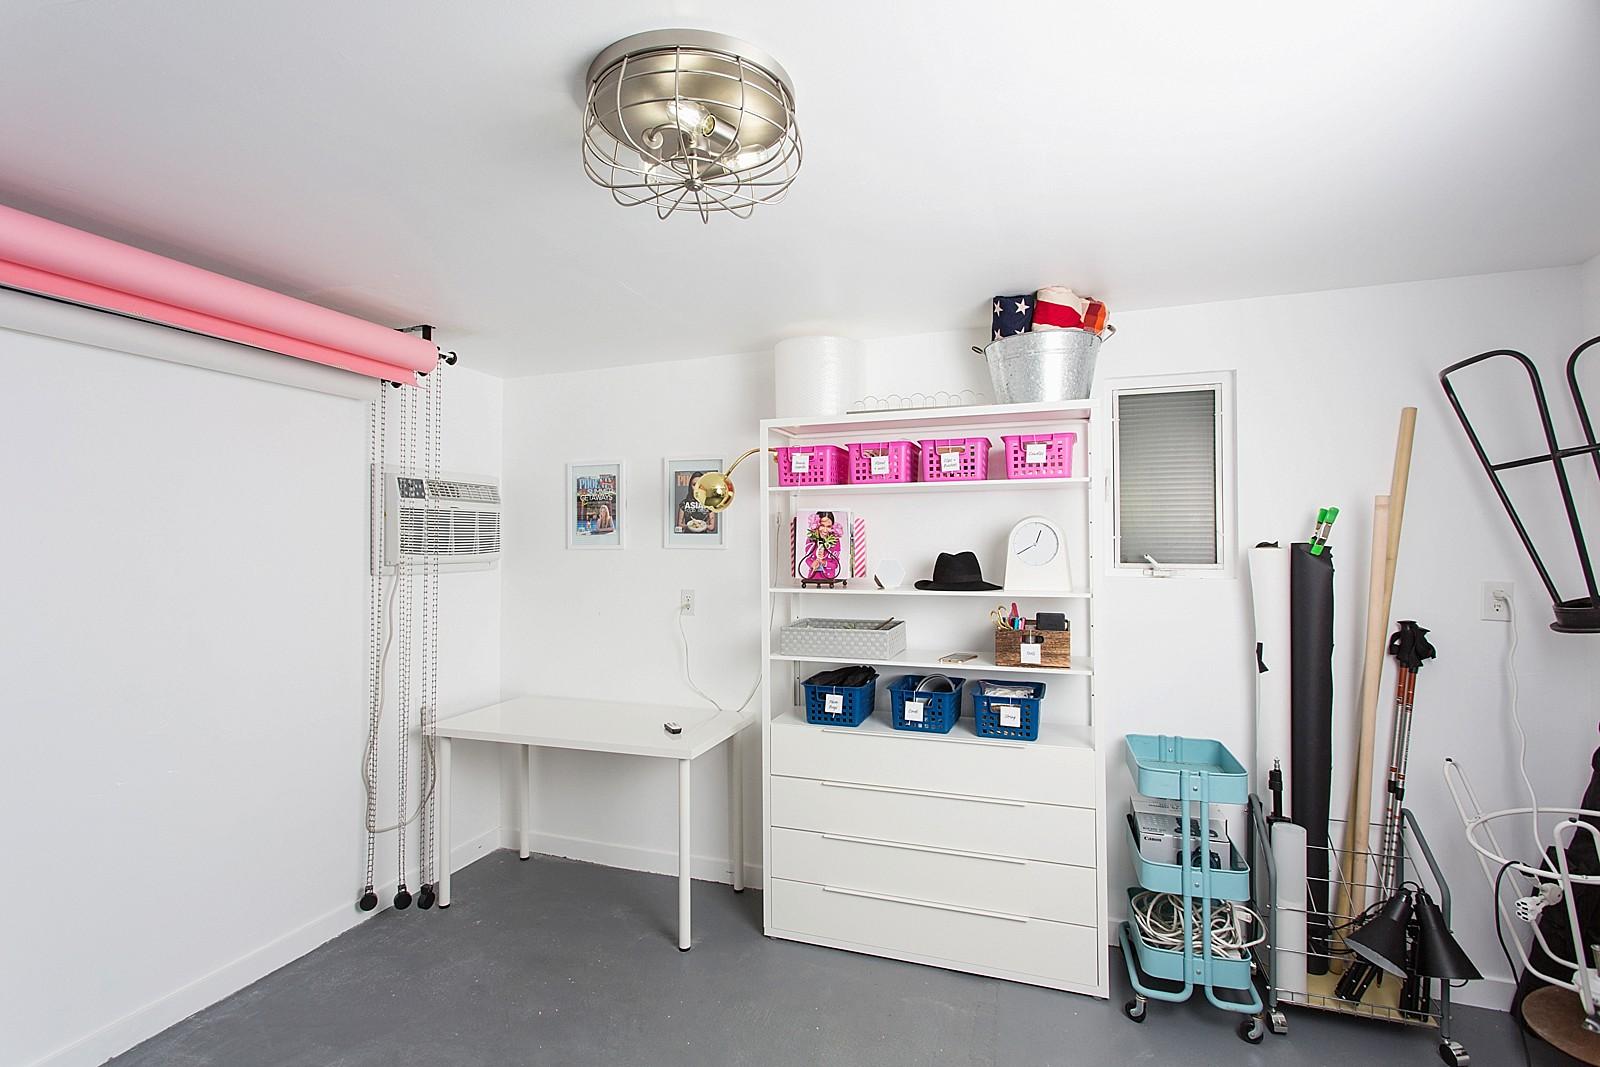 home-photography-studio-storage-tour-photographer-blogger-arizona-diana-elizabeth-blog-1990